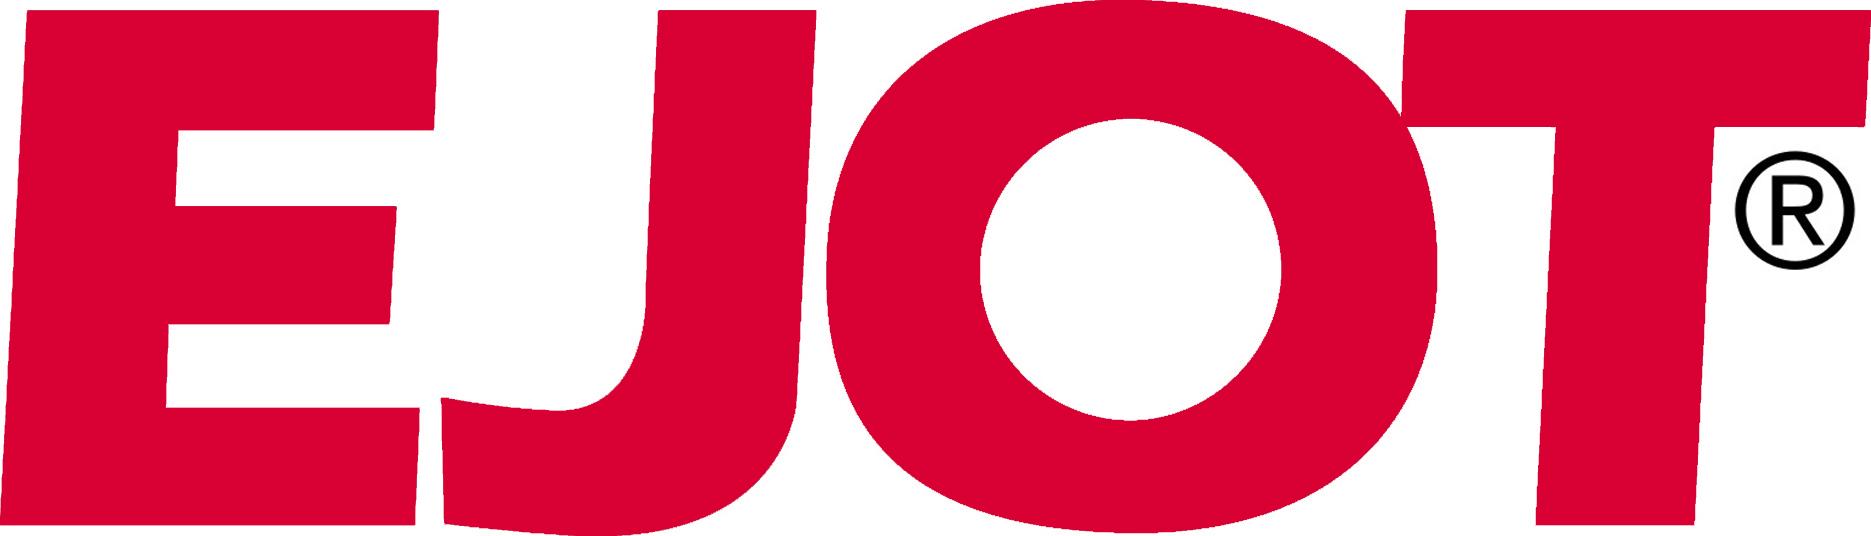 EJOT Schweiz AG Logo